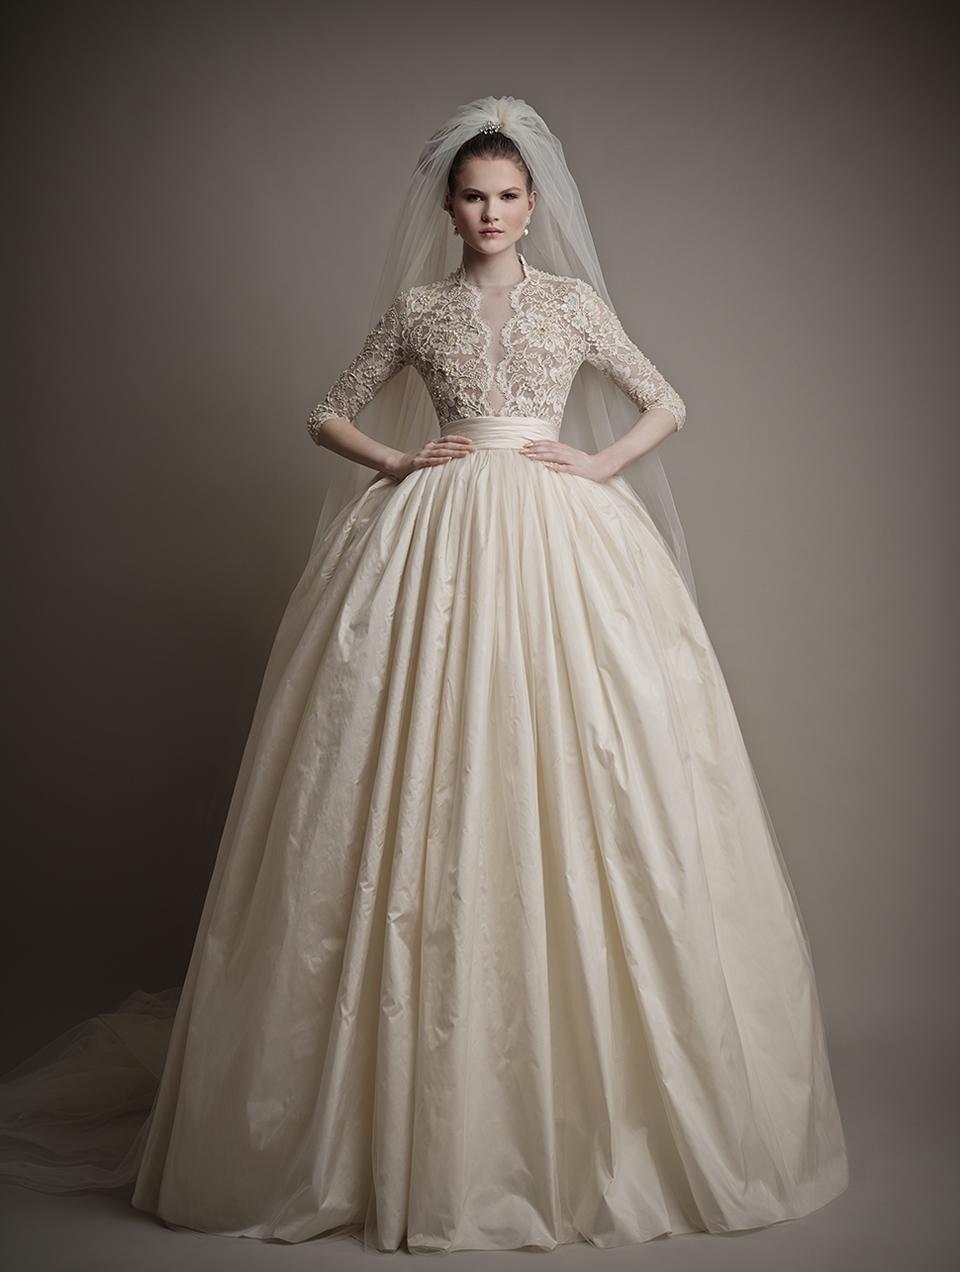 top long sleeved wedding dresses turtleneck wedding dress Ersa Atelier s Charlotte